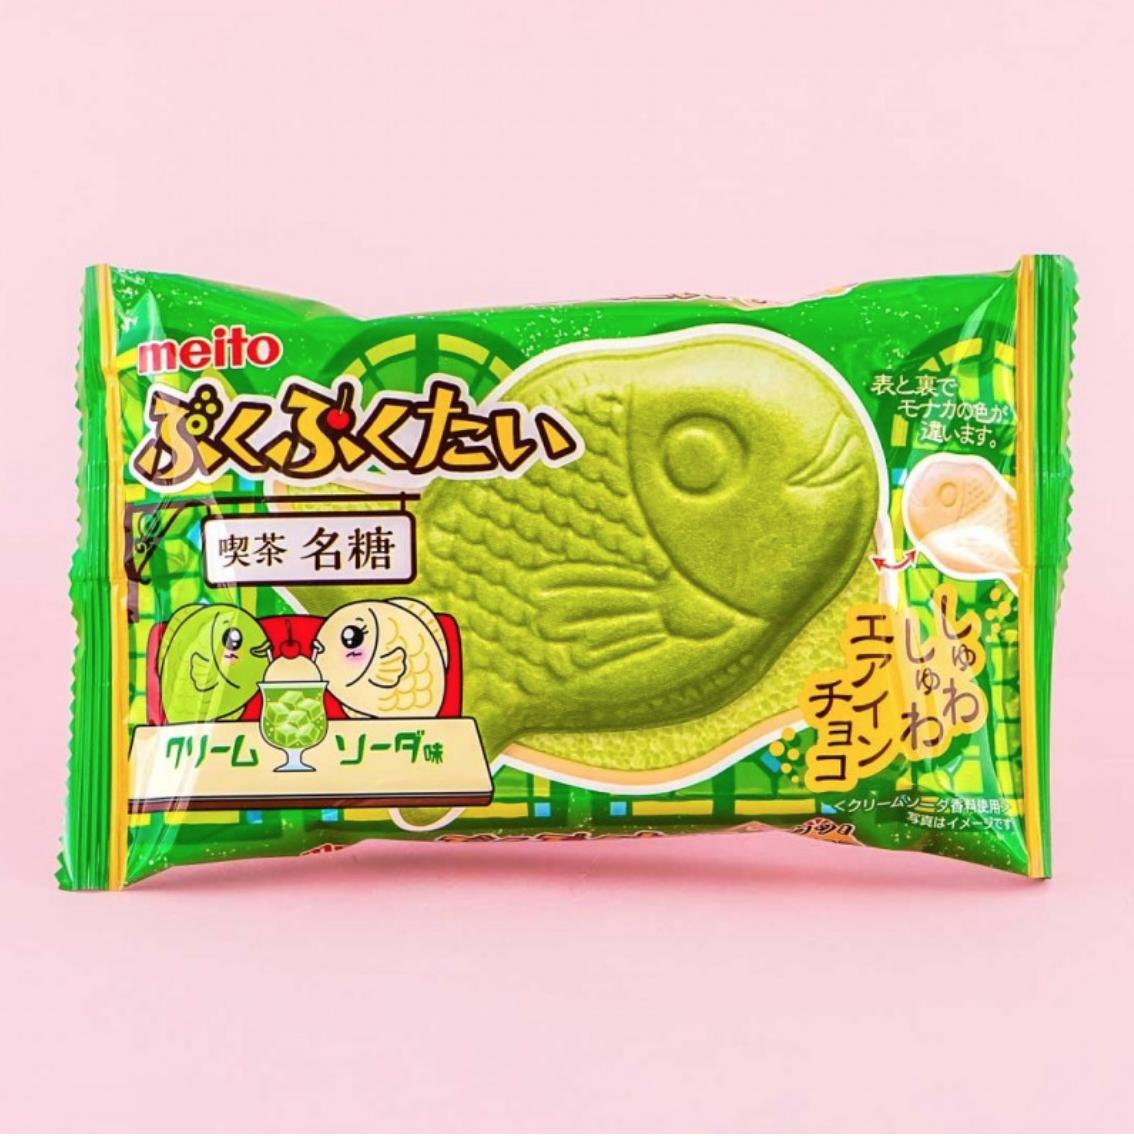 Meiji Meito Fish Shaped Wafer Matcha